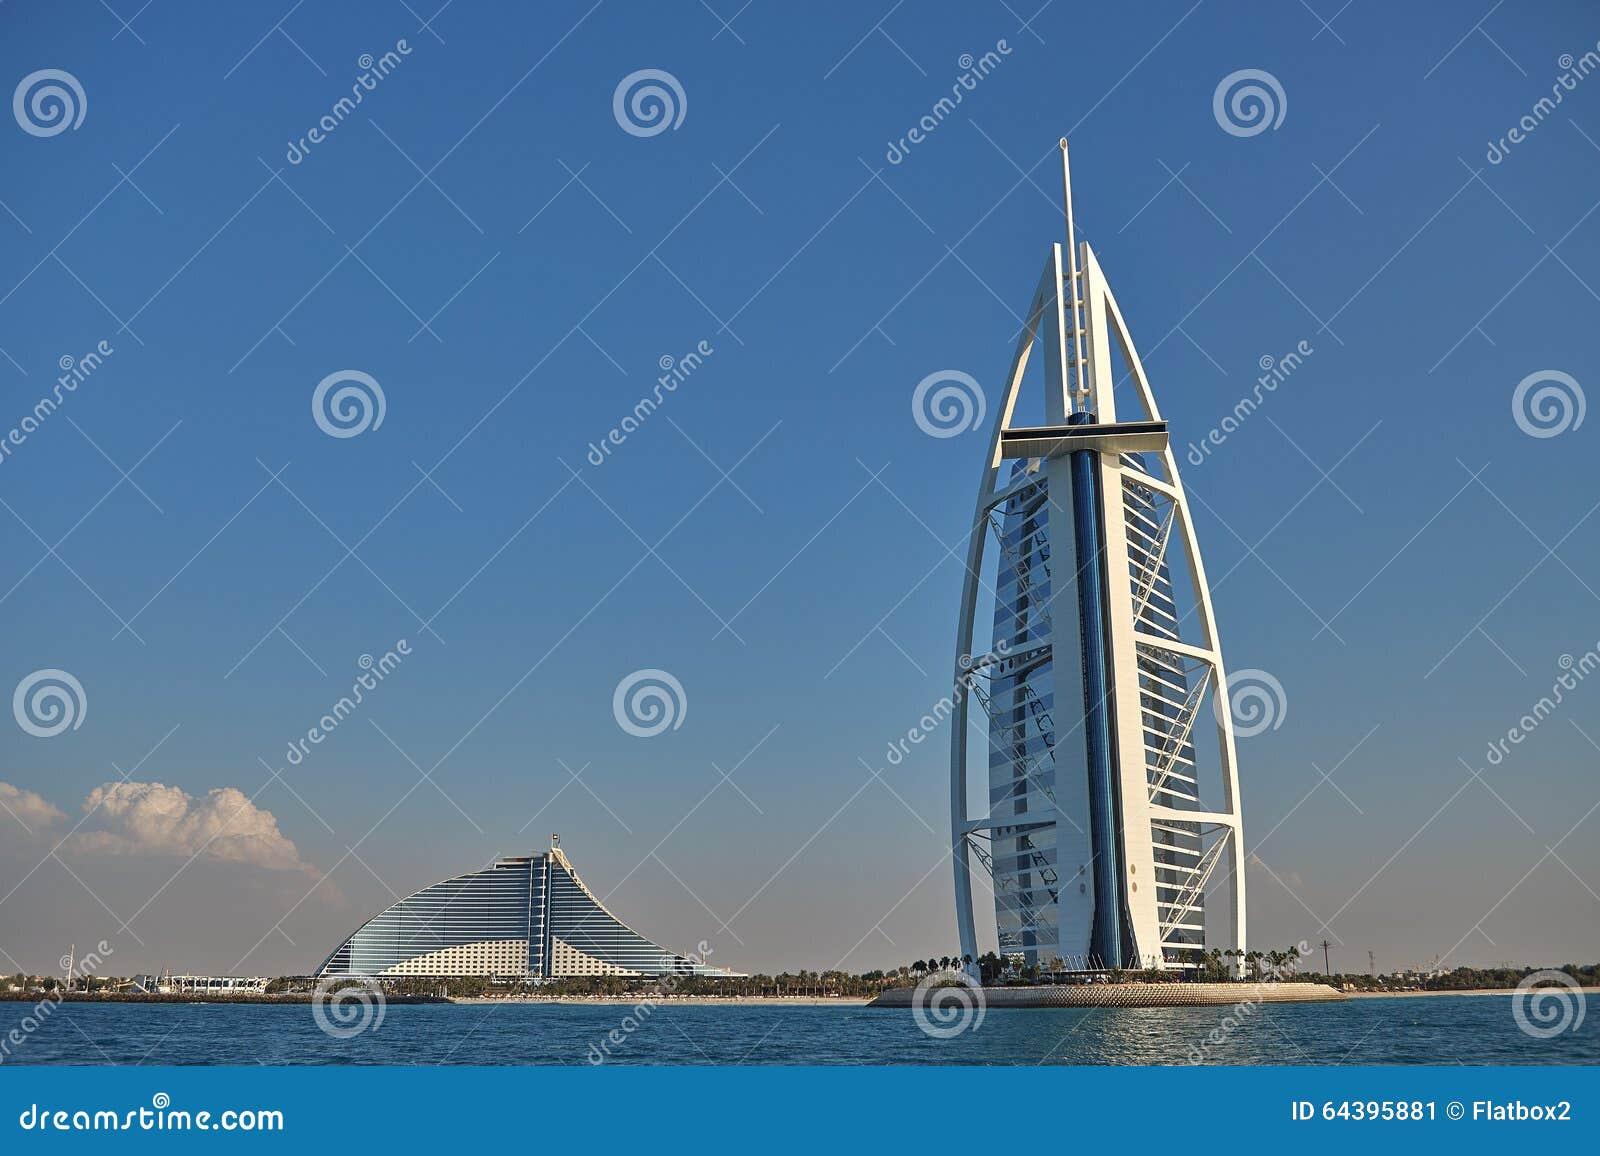 Luxury Hotel Burj Al Arab In Dubai Editorial Photo